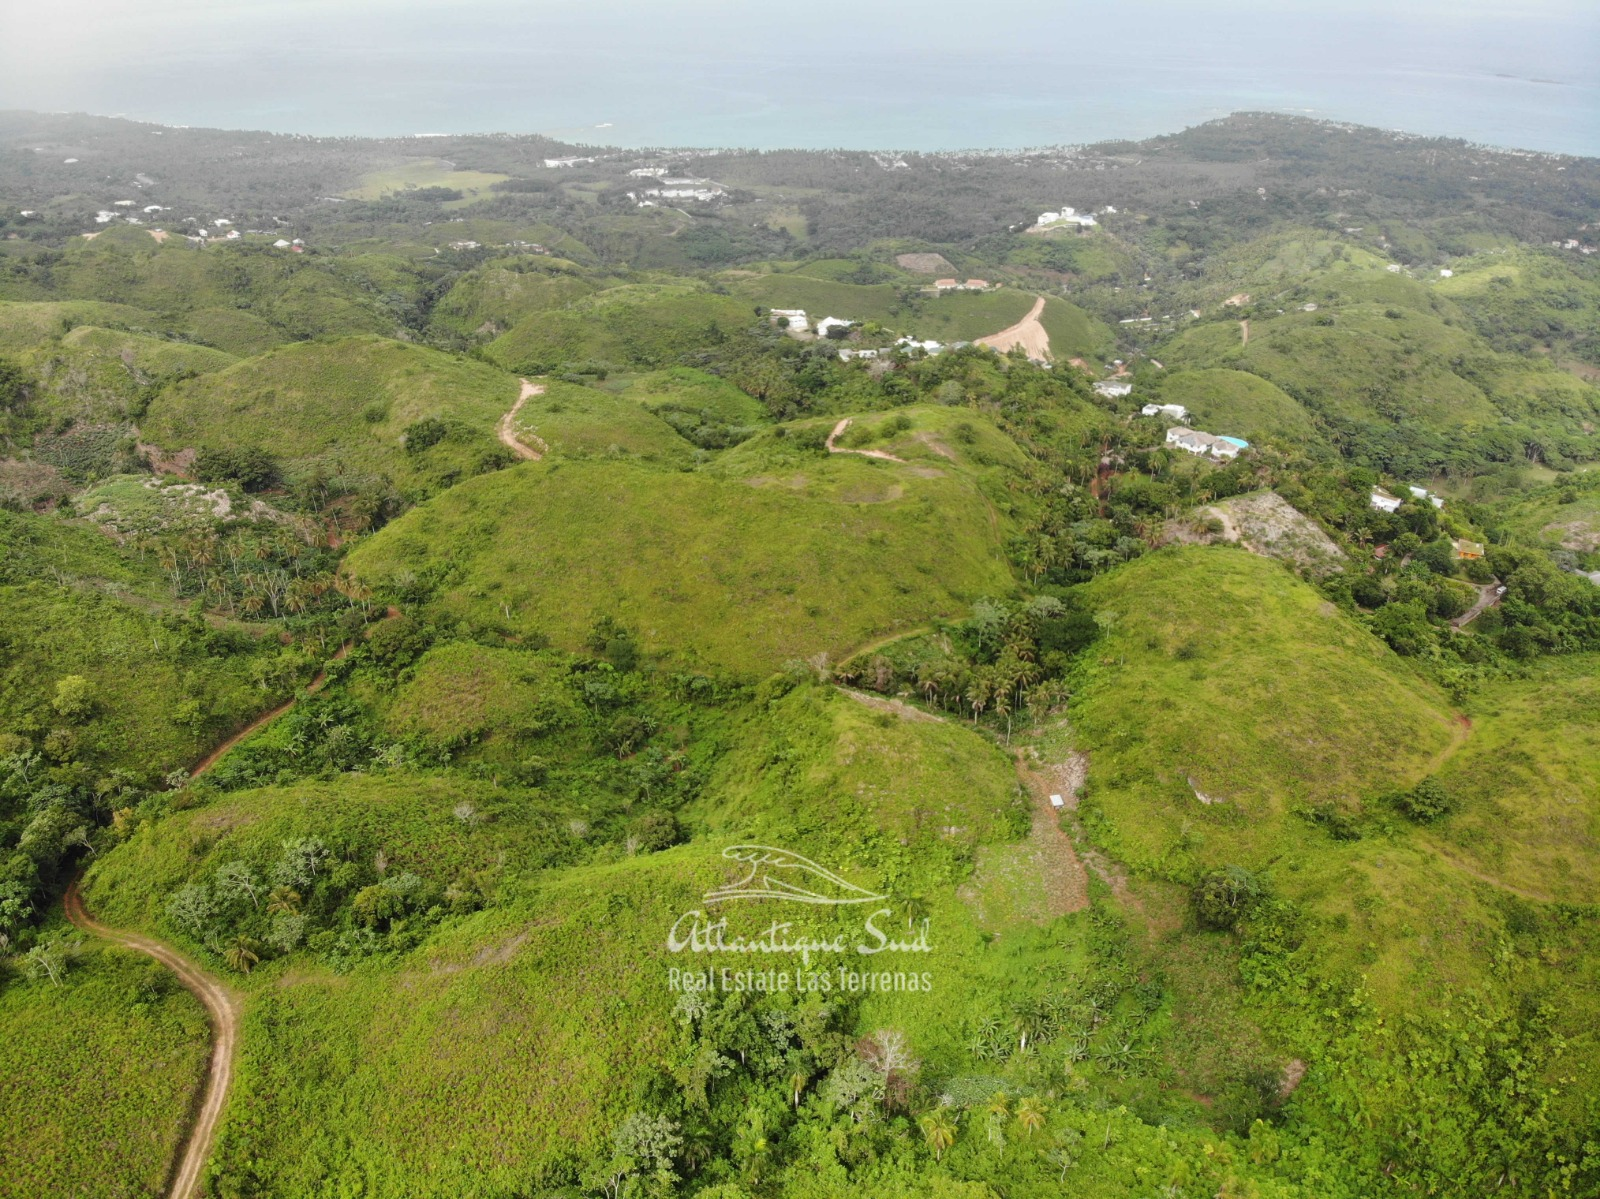 Hills for sale in Las Terrenas Dominican Republic 13.jpeg